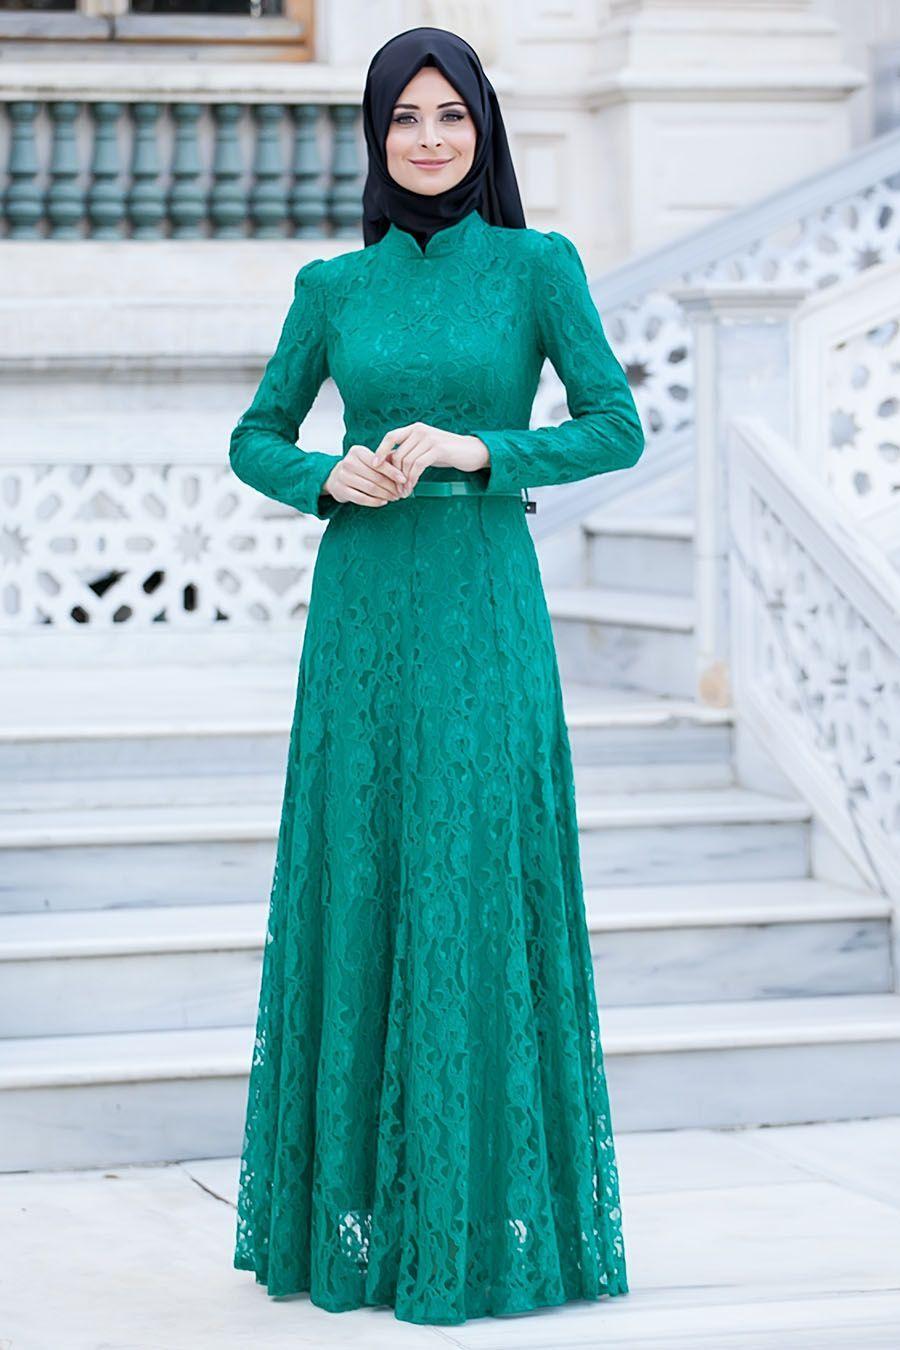 Tesetturlu Abiye Elbiseler Tesetturlu Abiye Elbise Dantelli Yesil Elbise Tesettur Bayan Giyimde Elbise Fera Model Pakaian Hijab Pakaian Wanita Model Pakaian